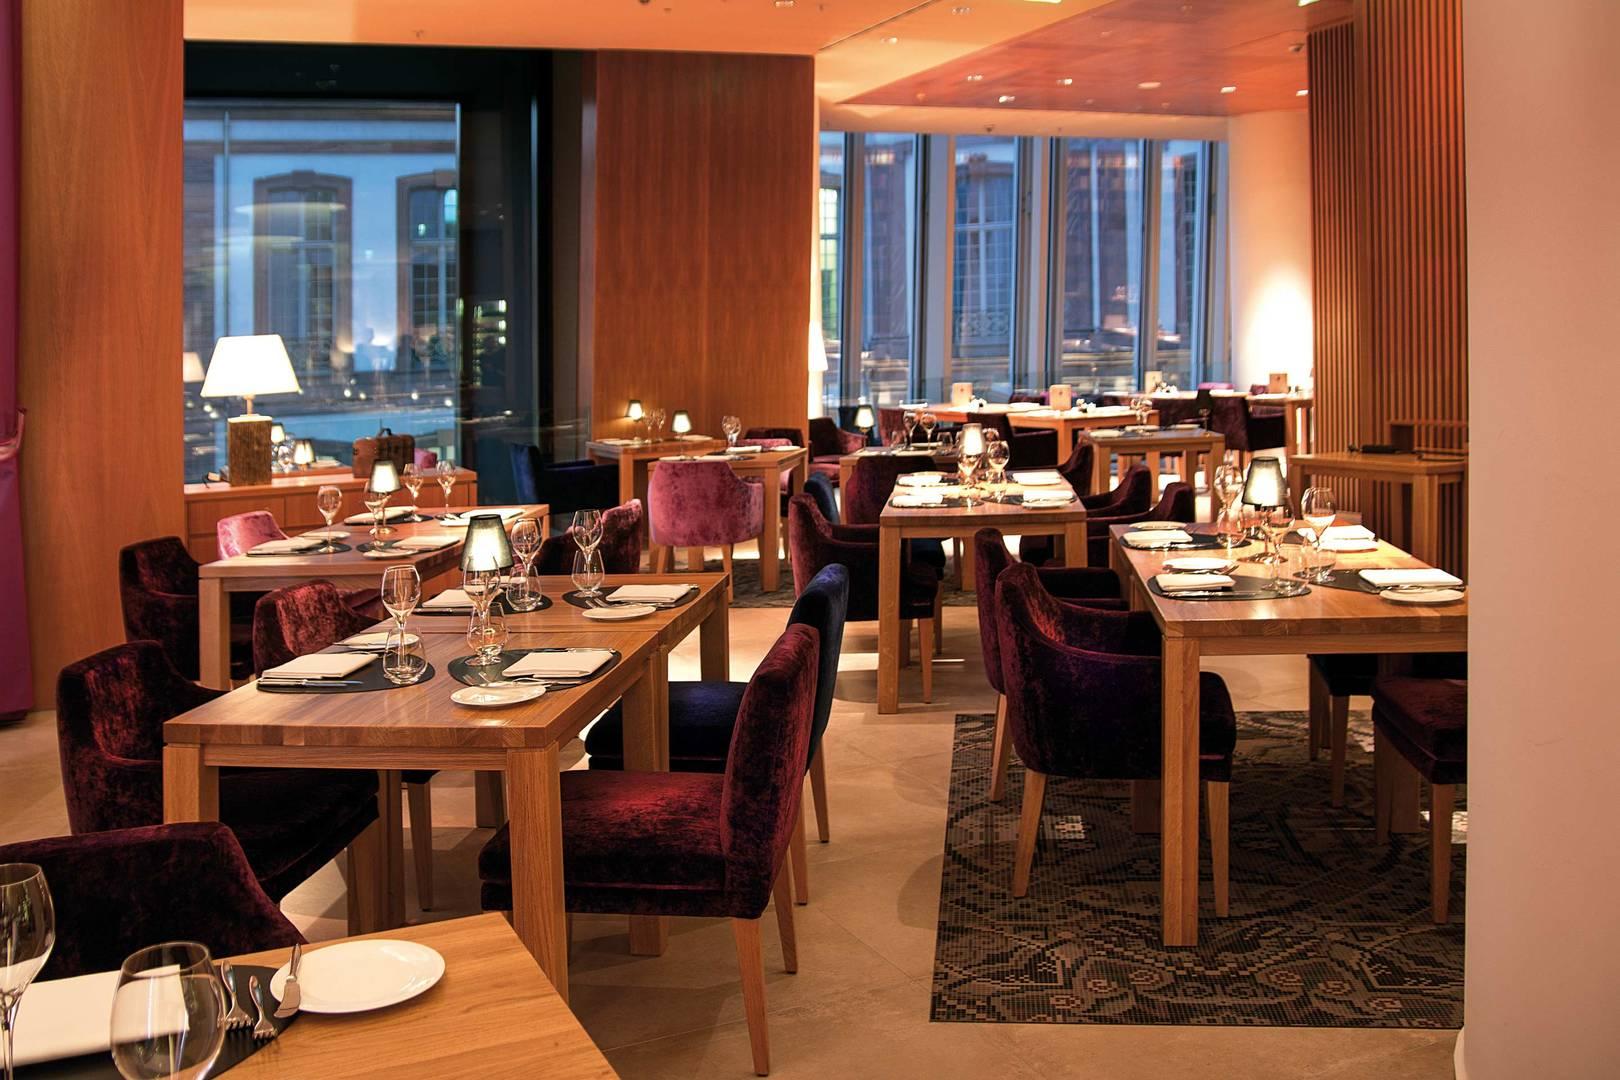 https://cdn.jumeirah.com/-/mediadh/DH/Hospitality/Jumeirah/Restaurants/Frankfurt/Frankfurt-Max-On-One-Grill-Room/Restaurant-Gallery/Jumeirah-Frankfurt-Max-on-One-Grillroom-4_6-4.jpg?h=1080&w=1620&hash=0D5B5CC70D1D1C74FEF2D793A31123B0